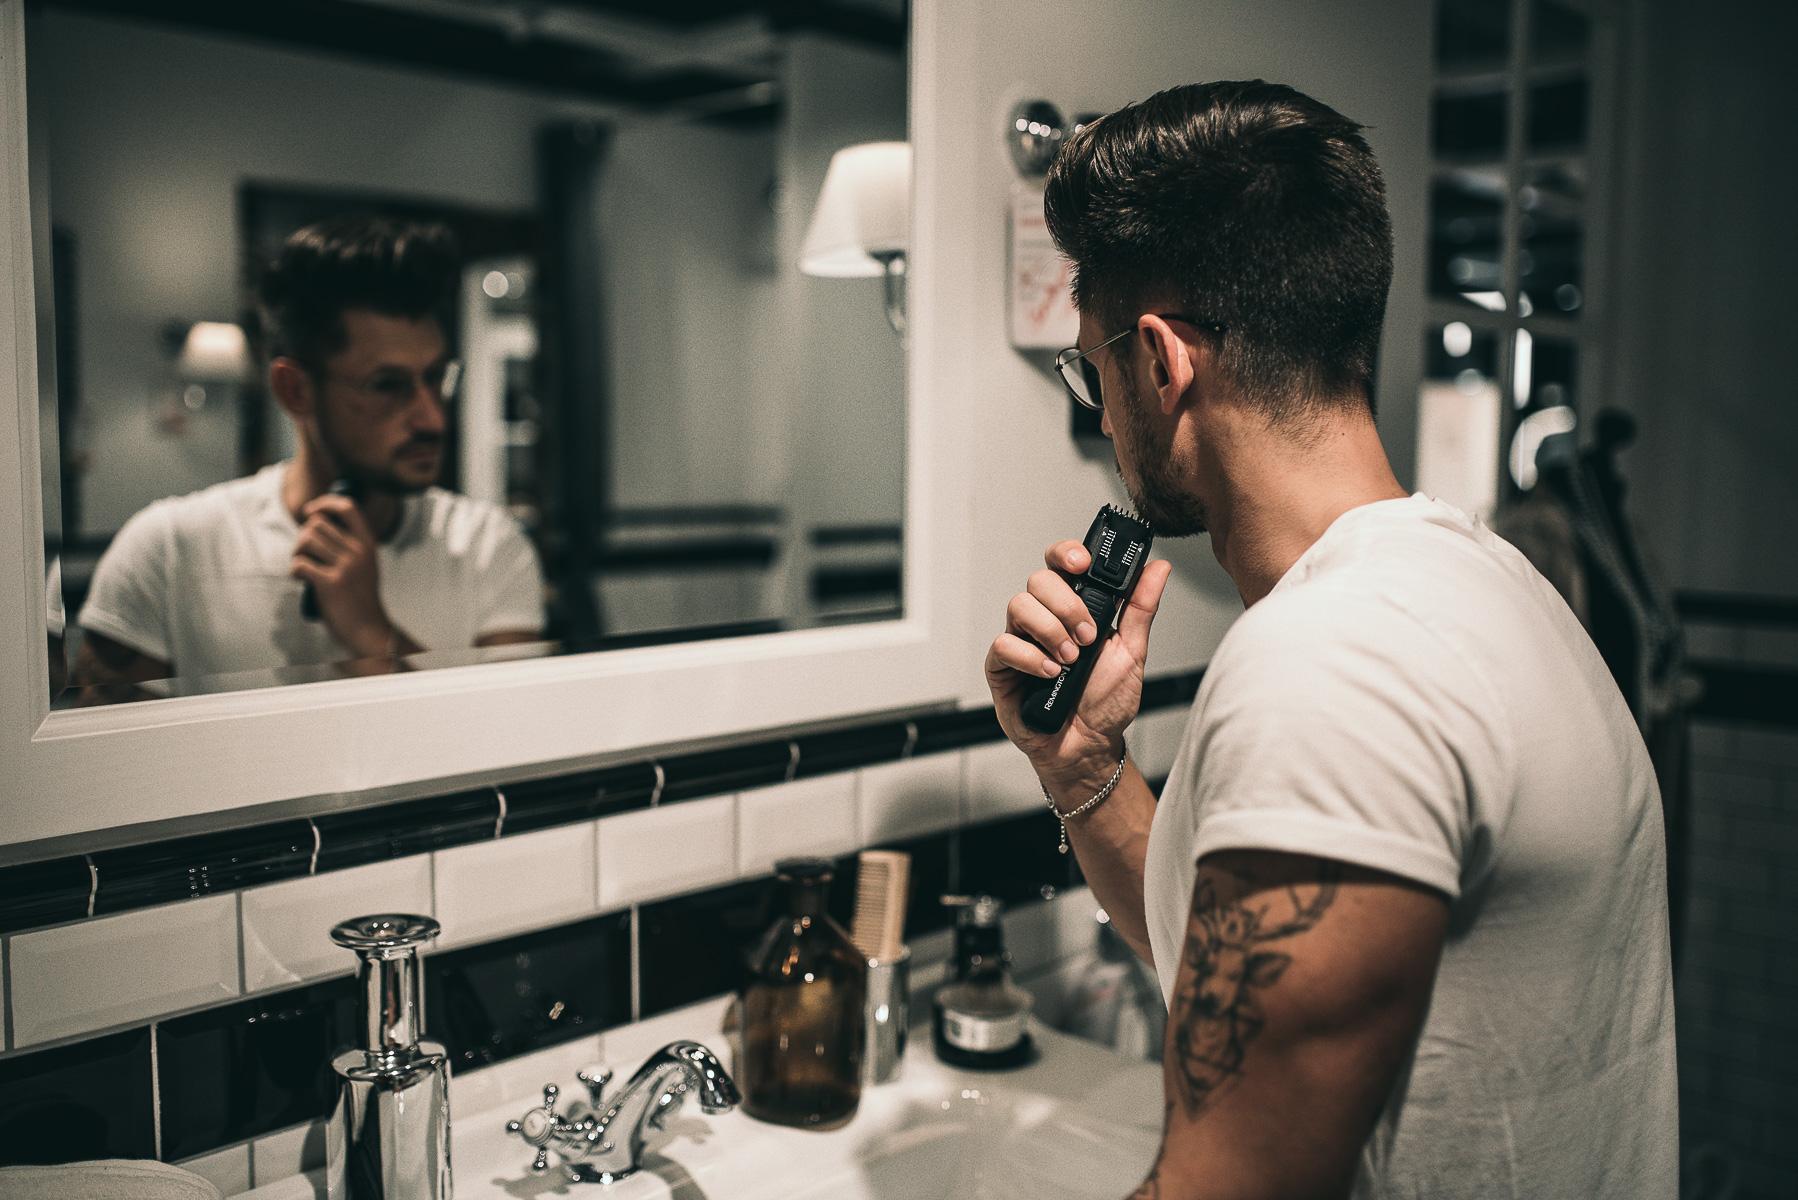 Tommeezjerry_Lifestyleblog-Fashionblog-Maennermodeblog-Maennerblog-Modeblog-Grooming-Beard-Beardcare-Shave-Shaving-Beauty-Remington-Shaver